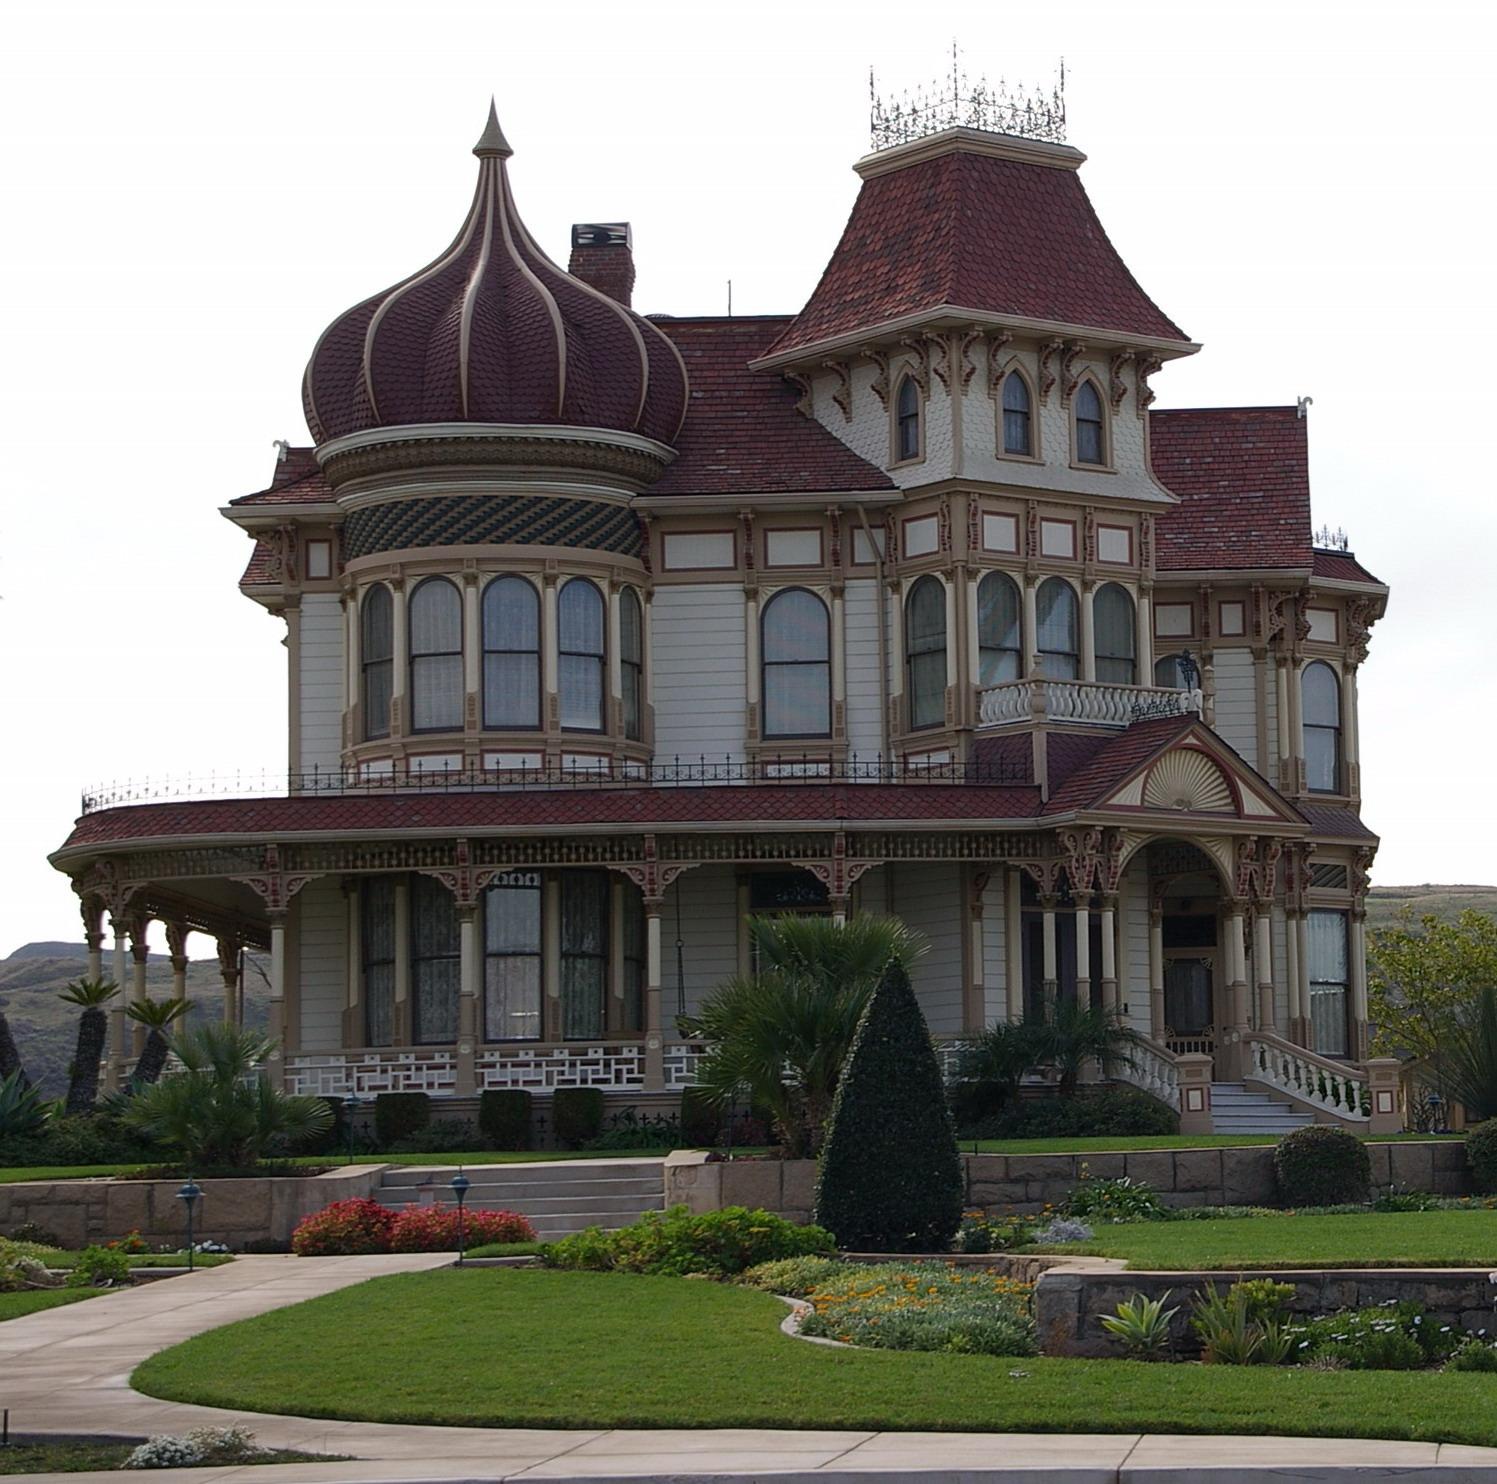 Victorian House in Redlands